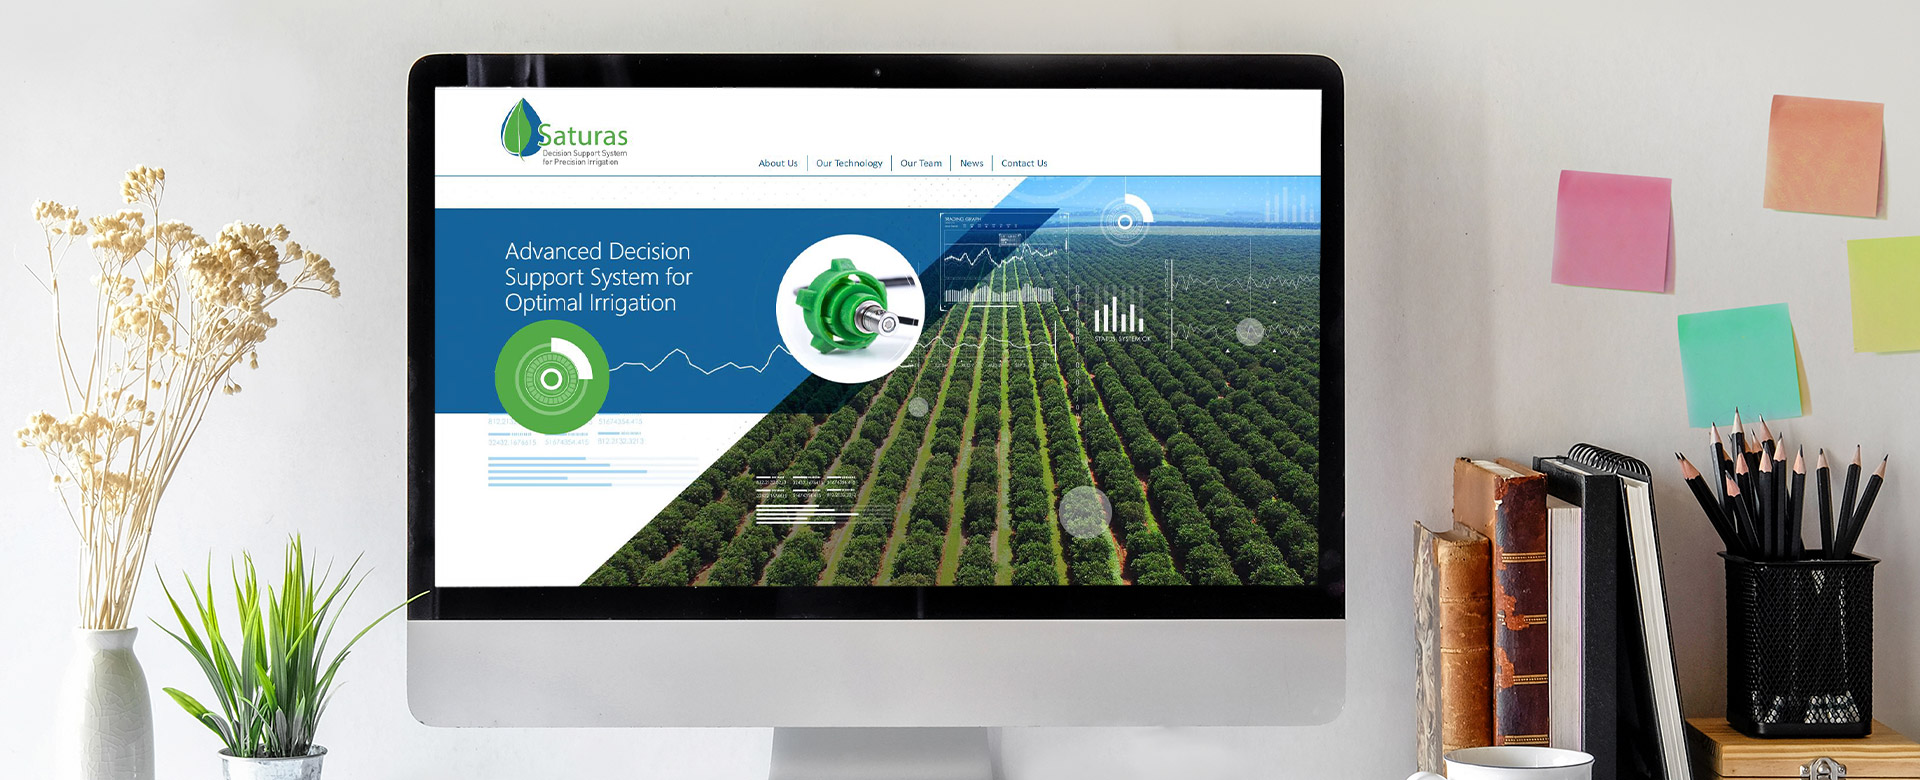 Saturas website